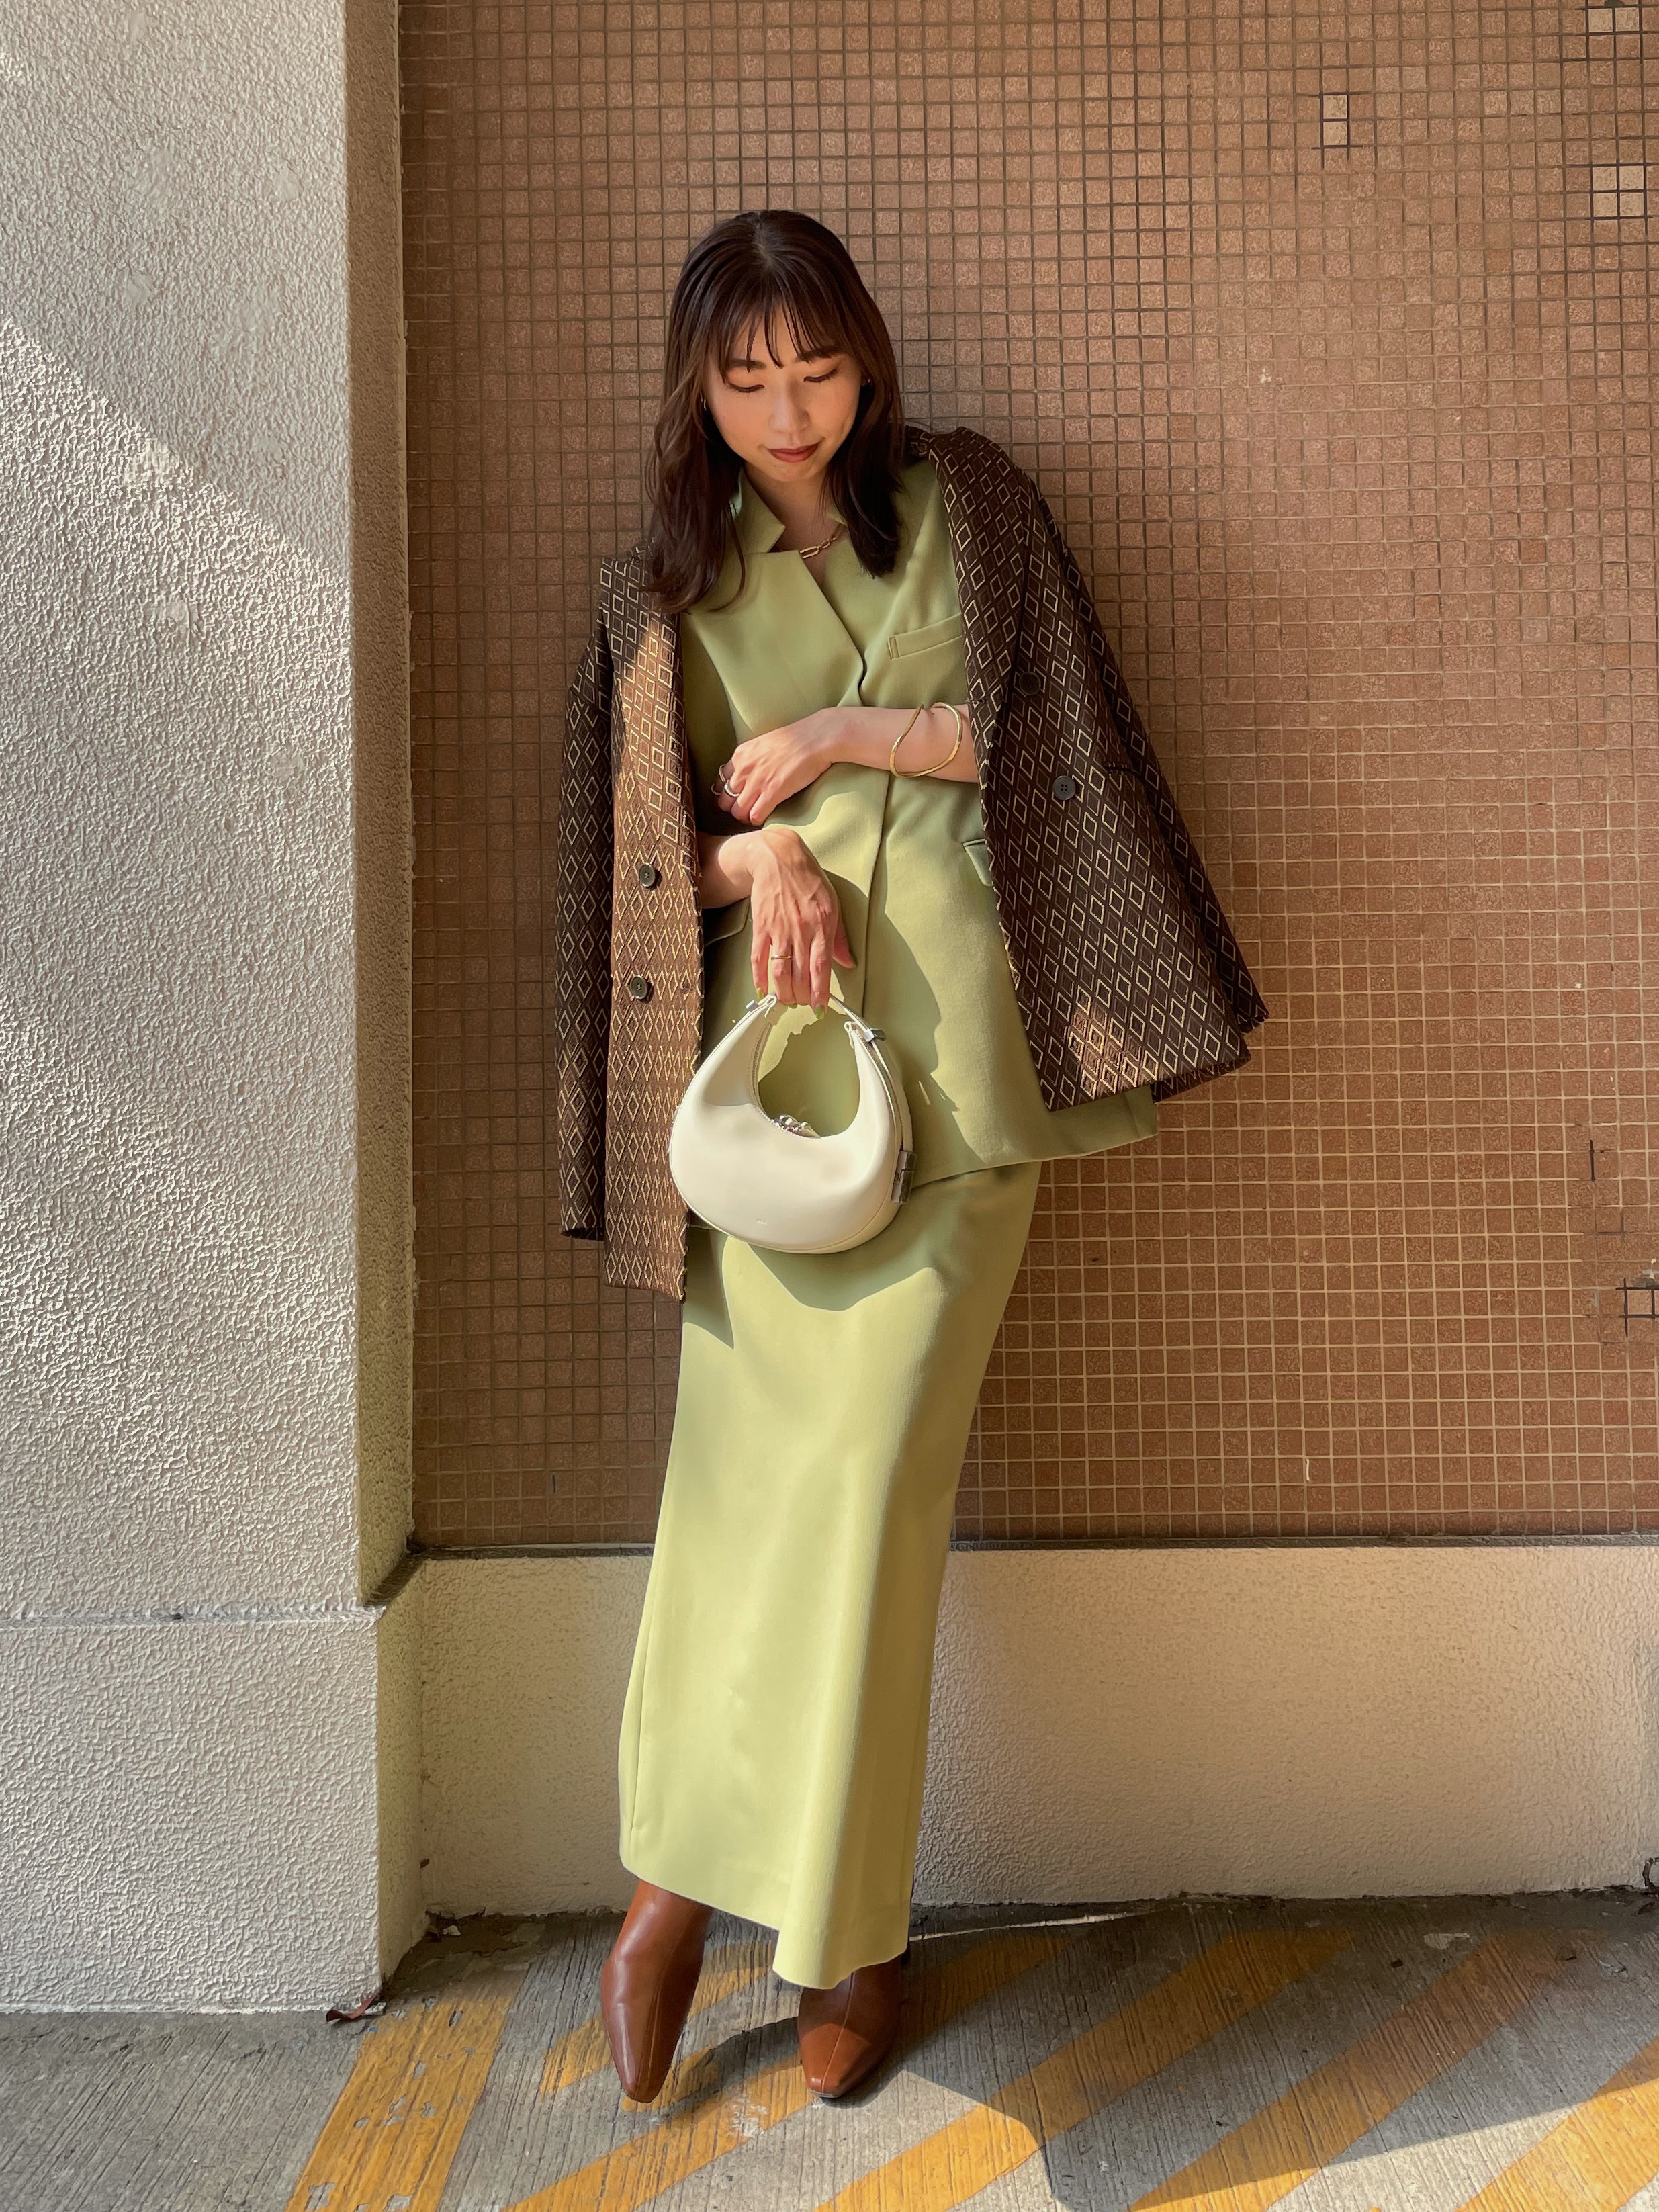 kaori_OTONA WRAP VEST SET UP DRESS